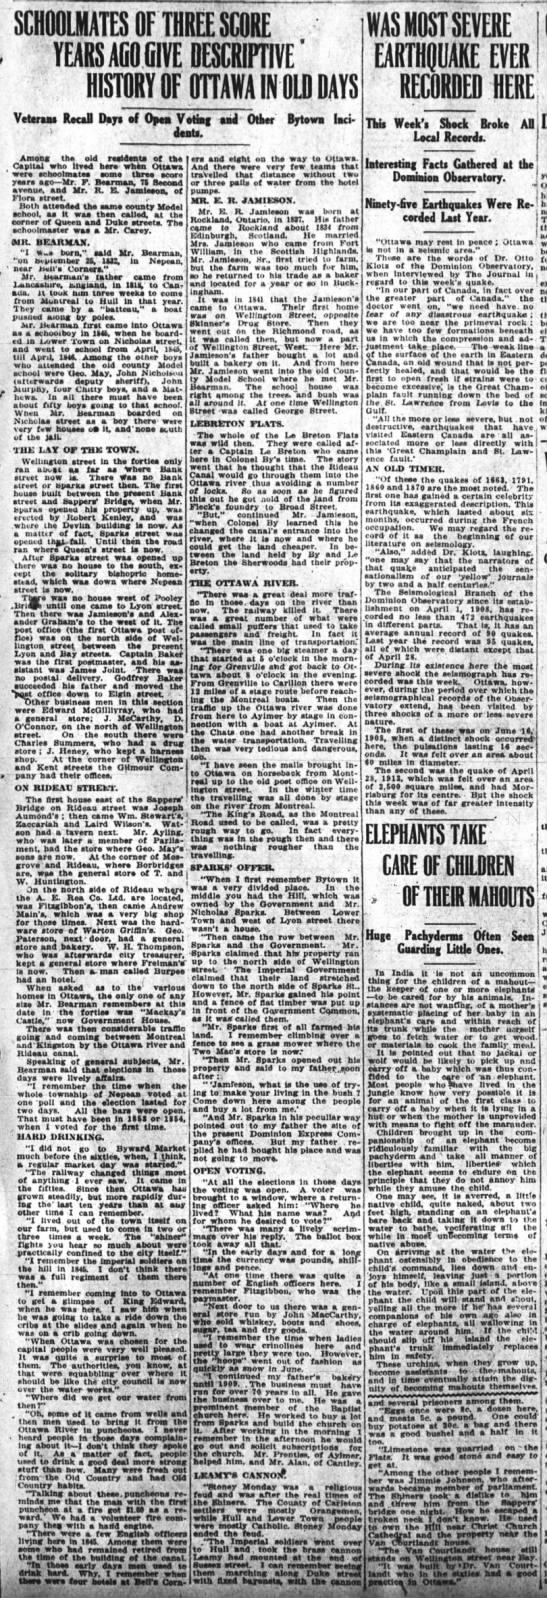 Old Ottawa (Bytown) History